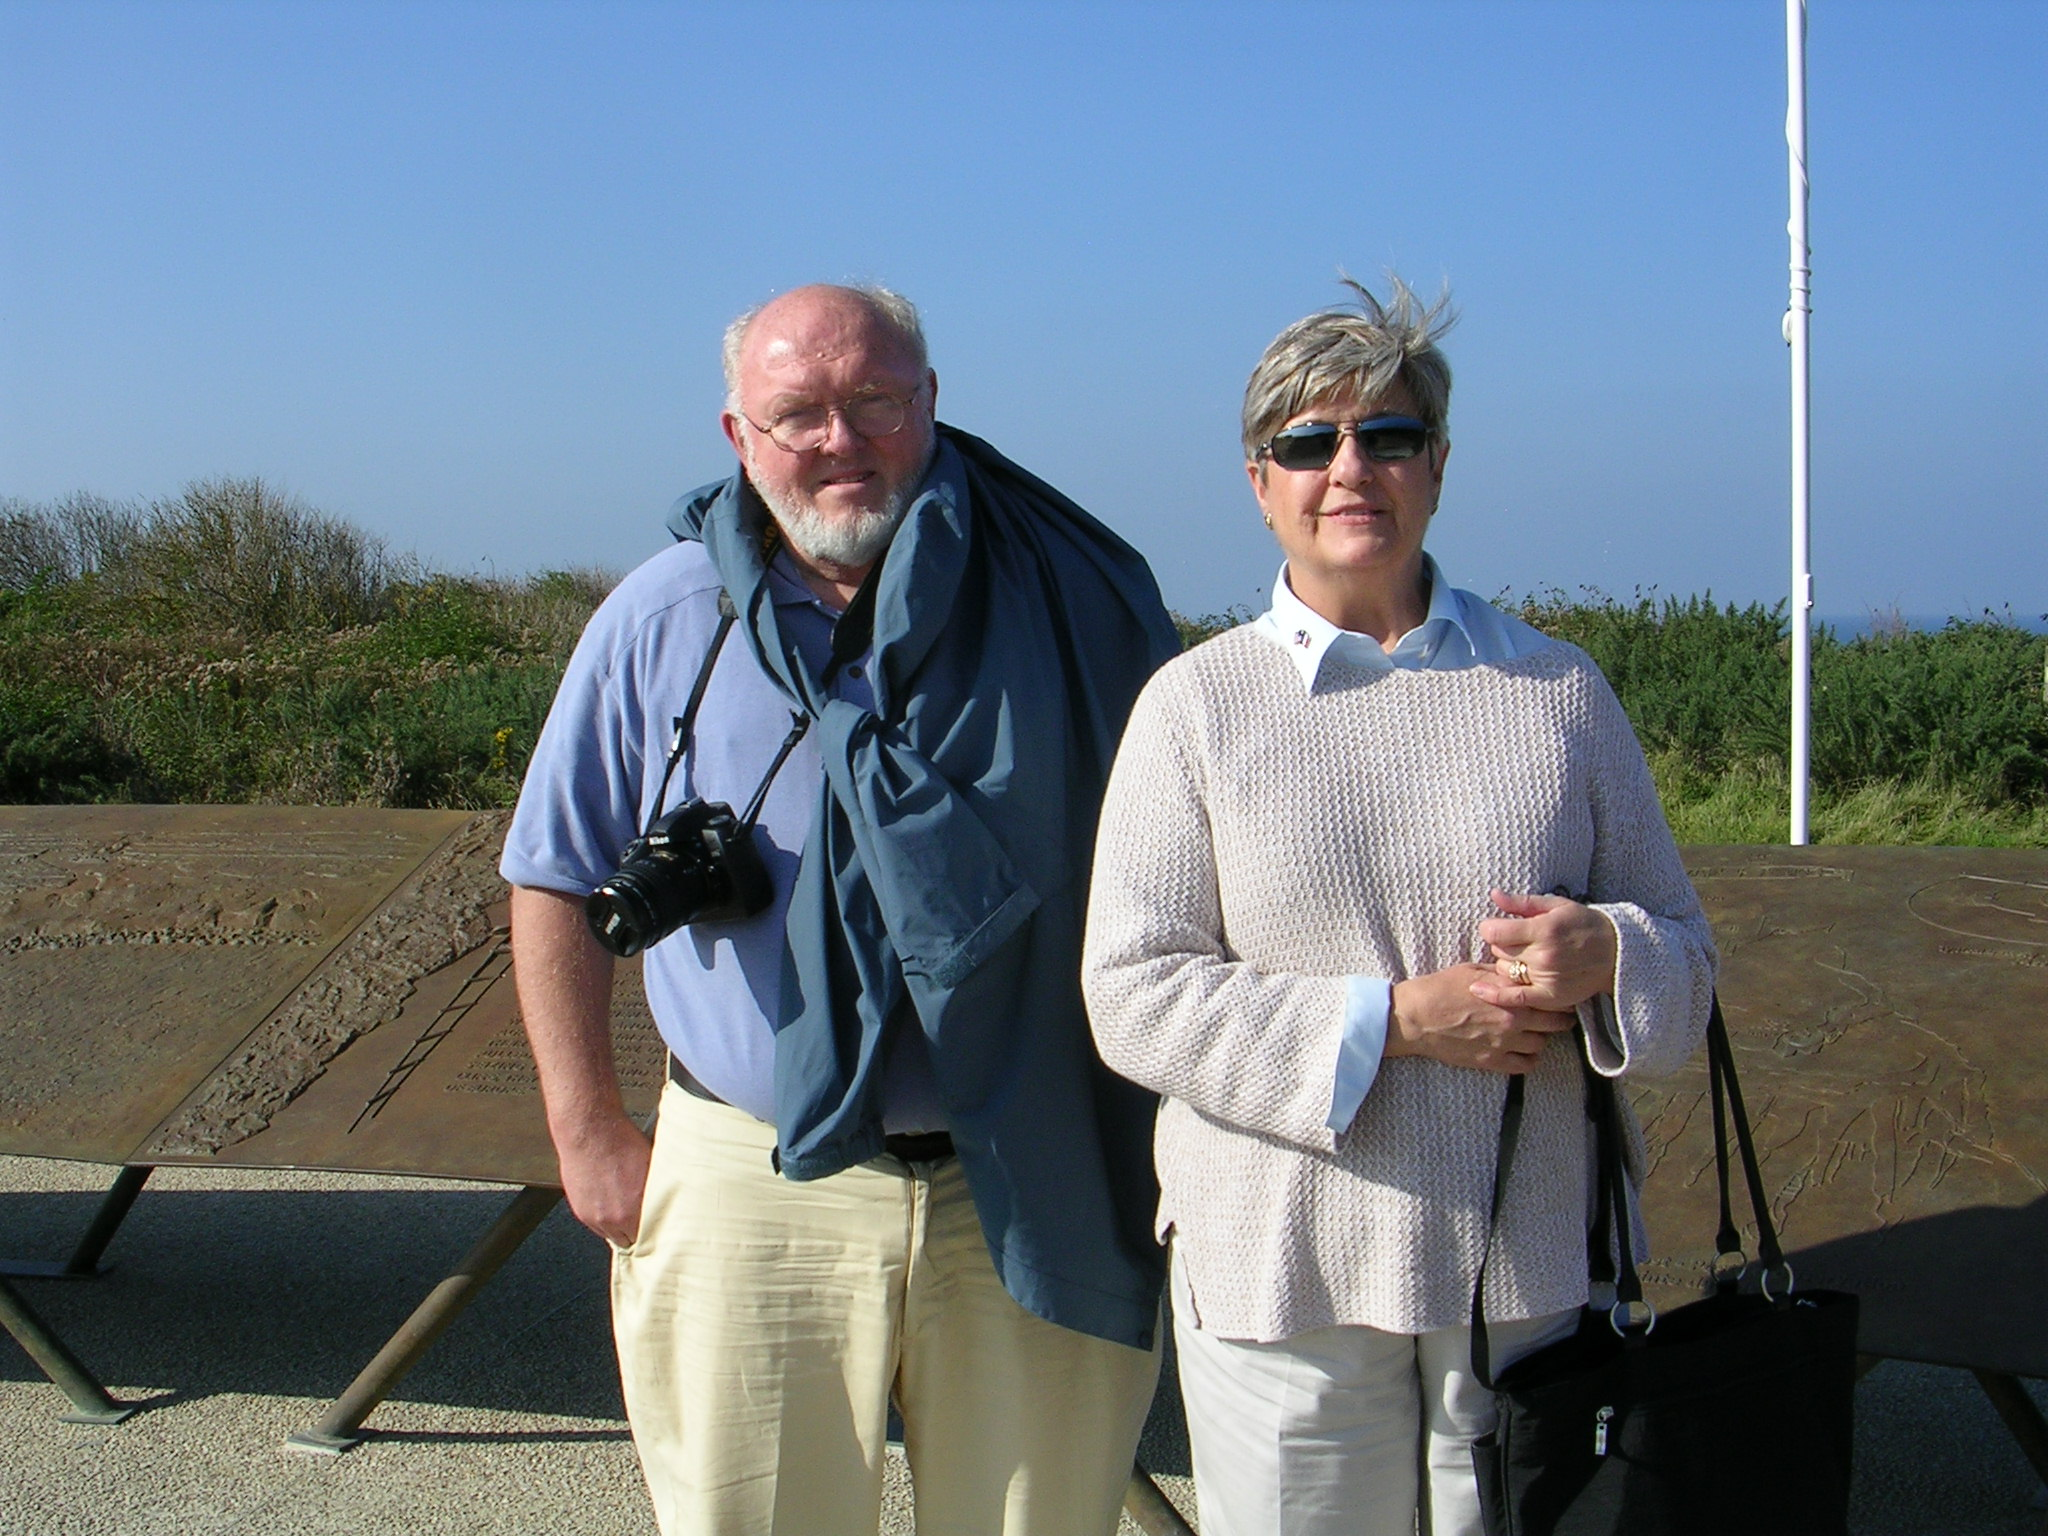 Alan and Mayor Wilks stand on Omaha Beach at Normandy